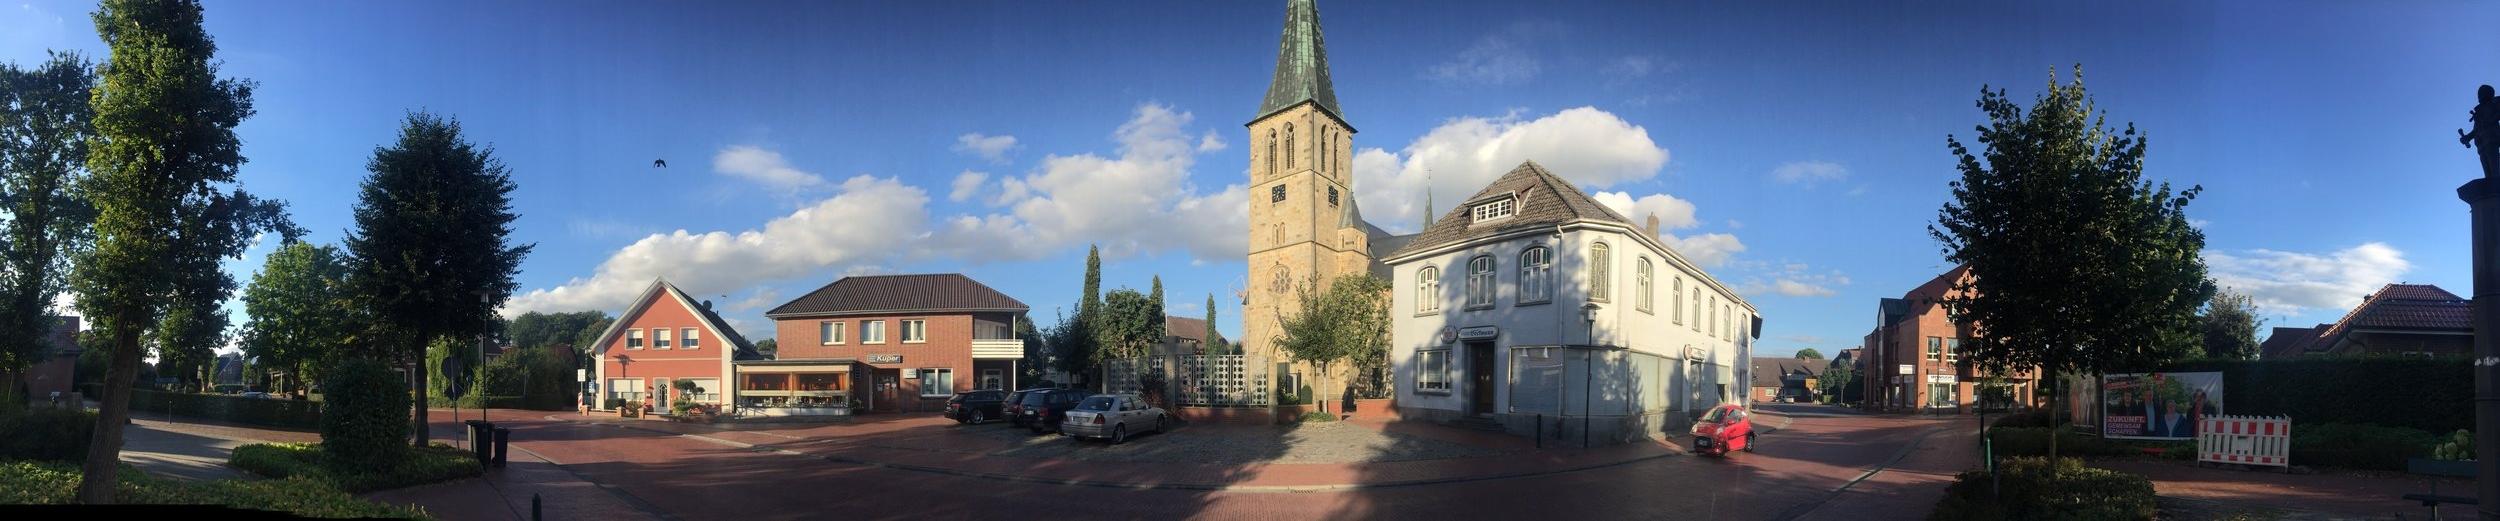 Bakum, Germany